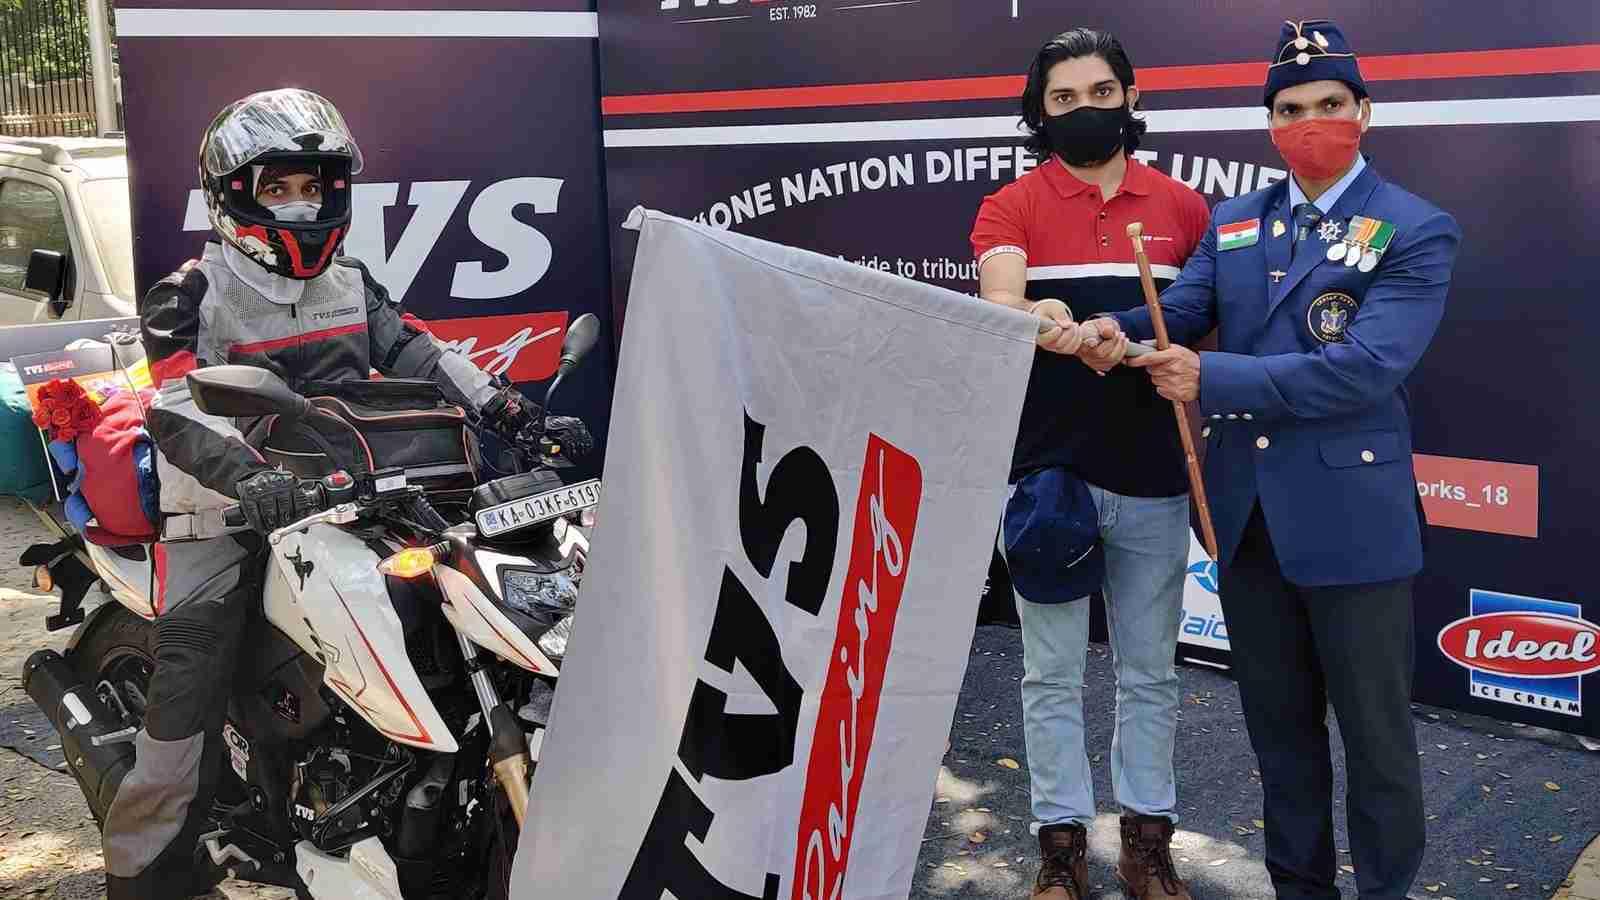 Mr. Shrivishnu S 'One Nation Different Uniform' ride powered by TVS